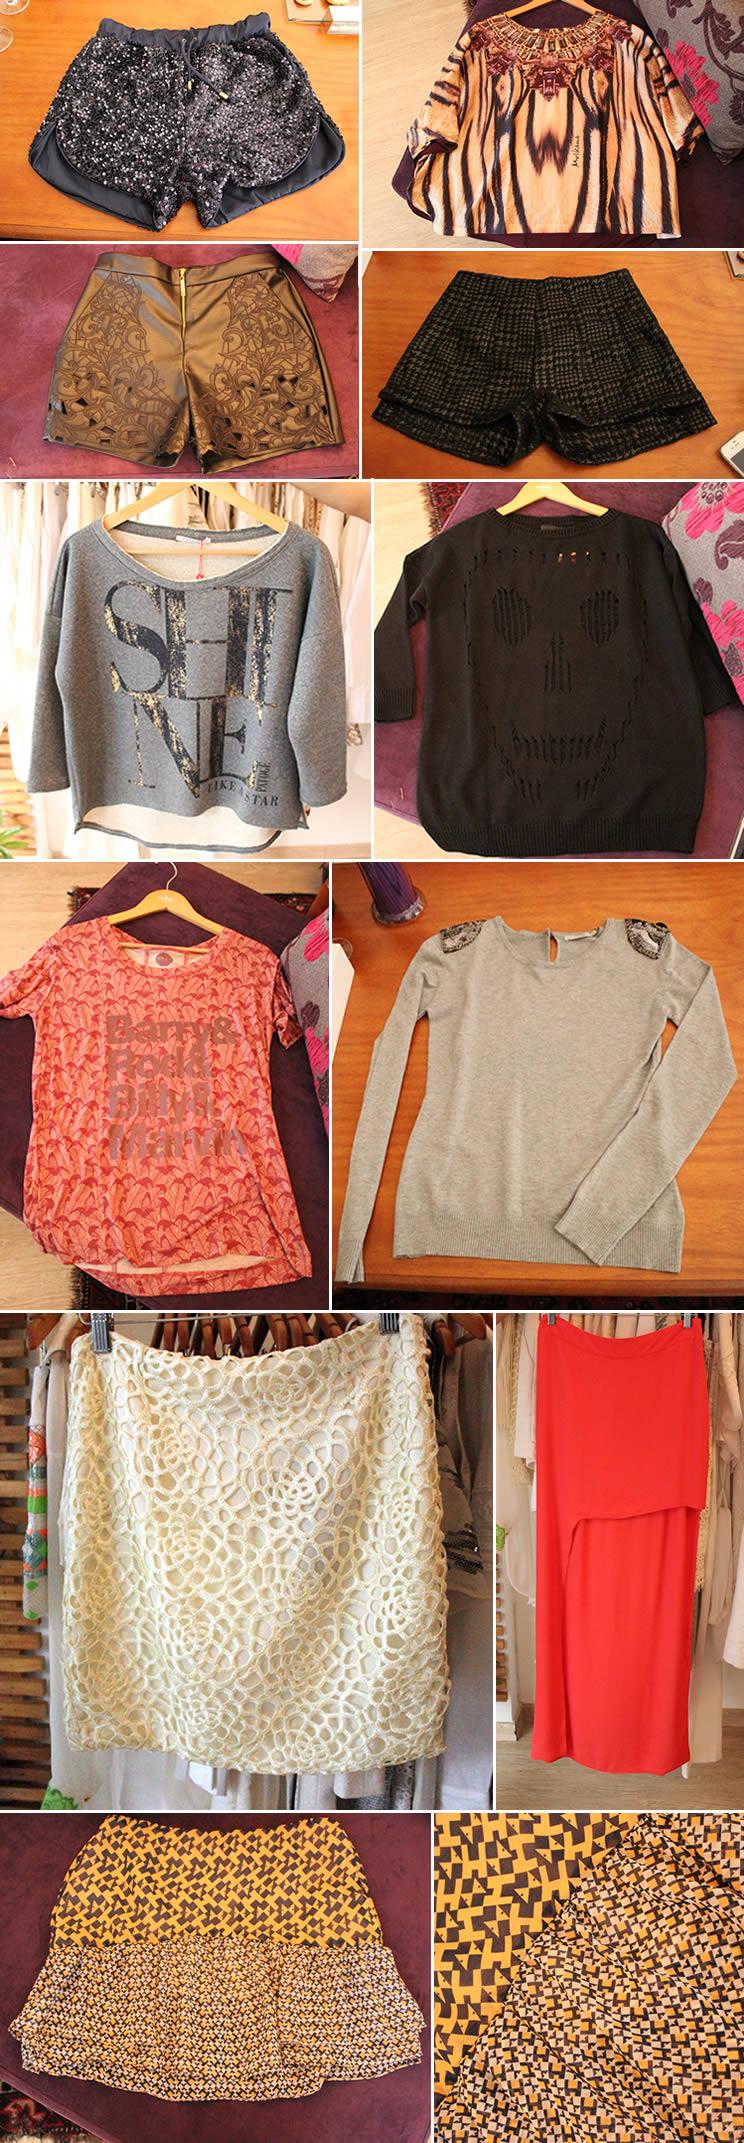 blusas-saia-t-shirts-calcas-loja-violet-gutierrez-rua-afonso-xIII-violet-multimarcas-trettiore-moikana-smell-mix-n-match-patoge